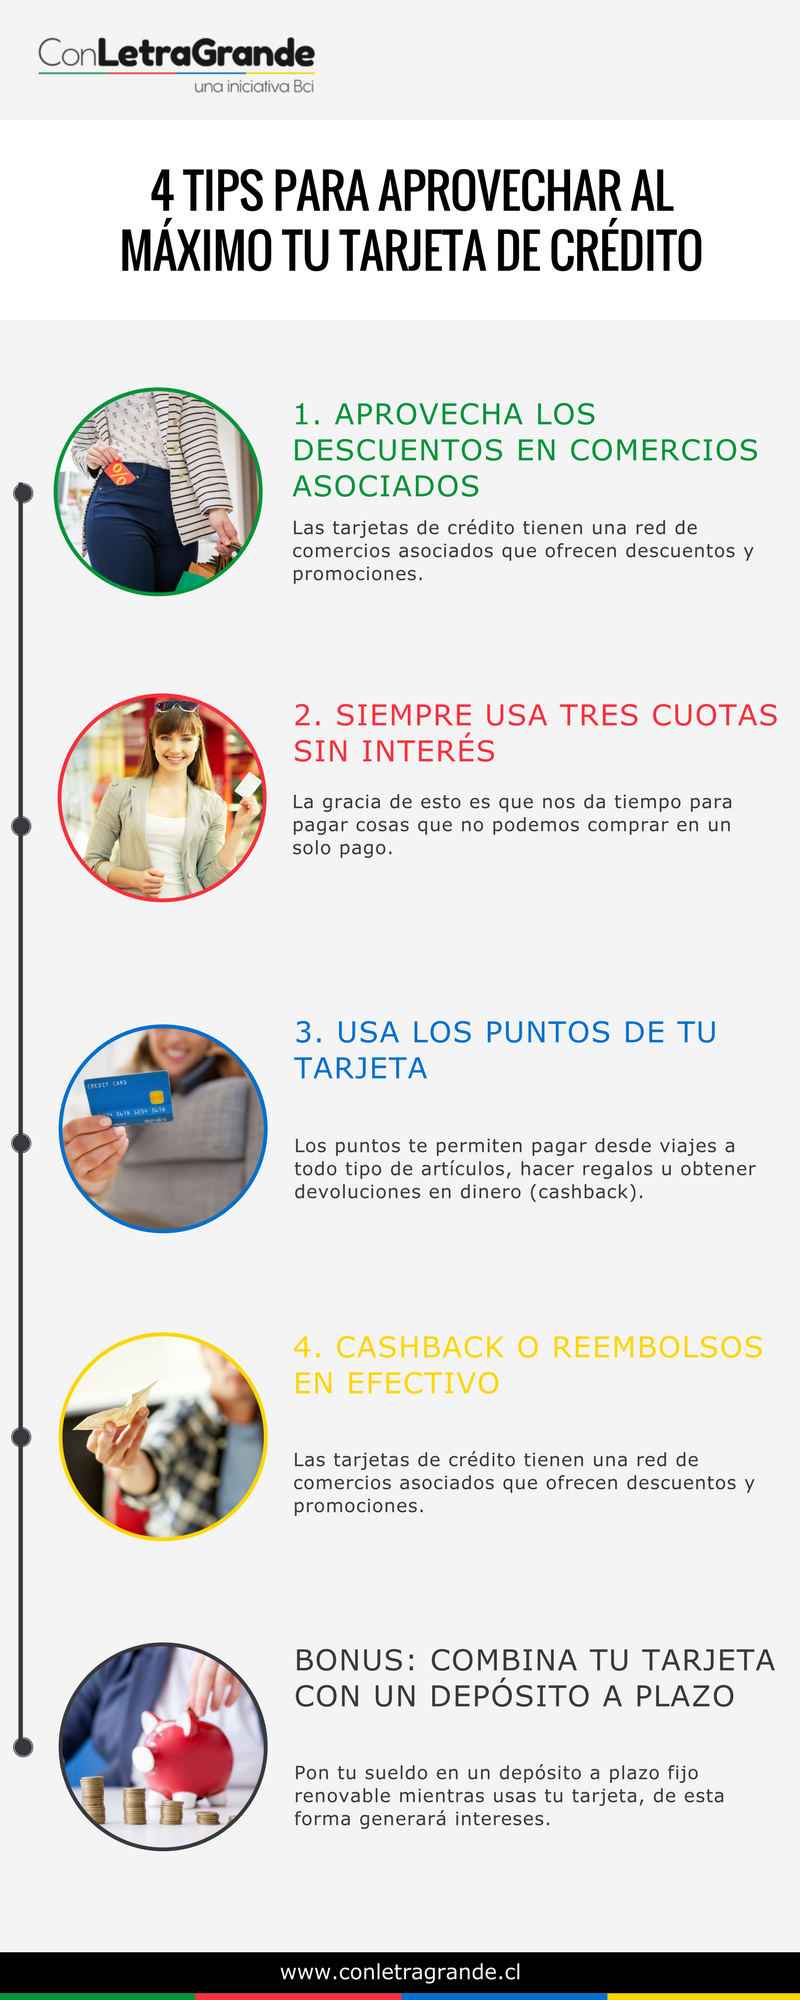 4 tips para aprovechar al máximo tu tarjeta de crédito